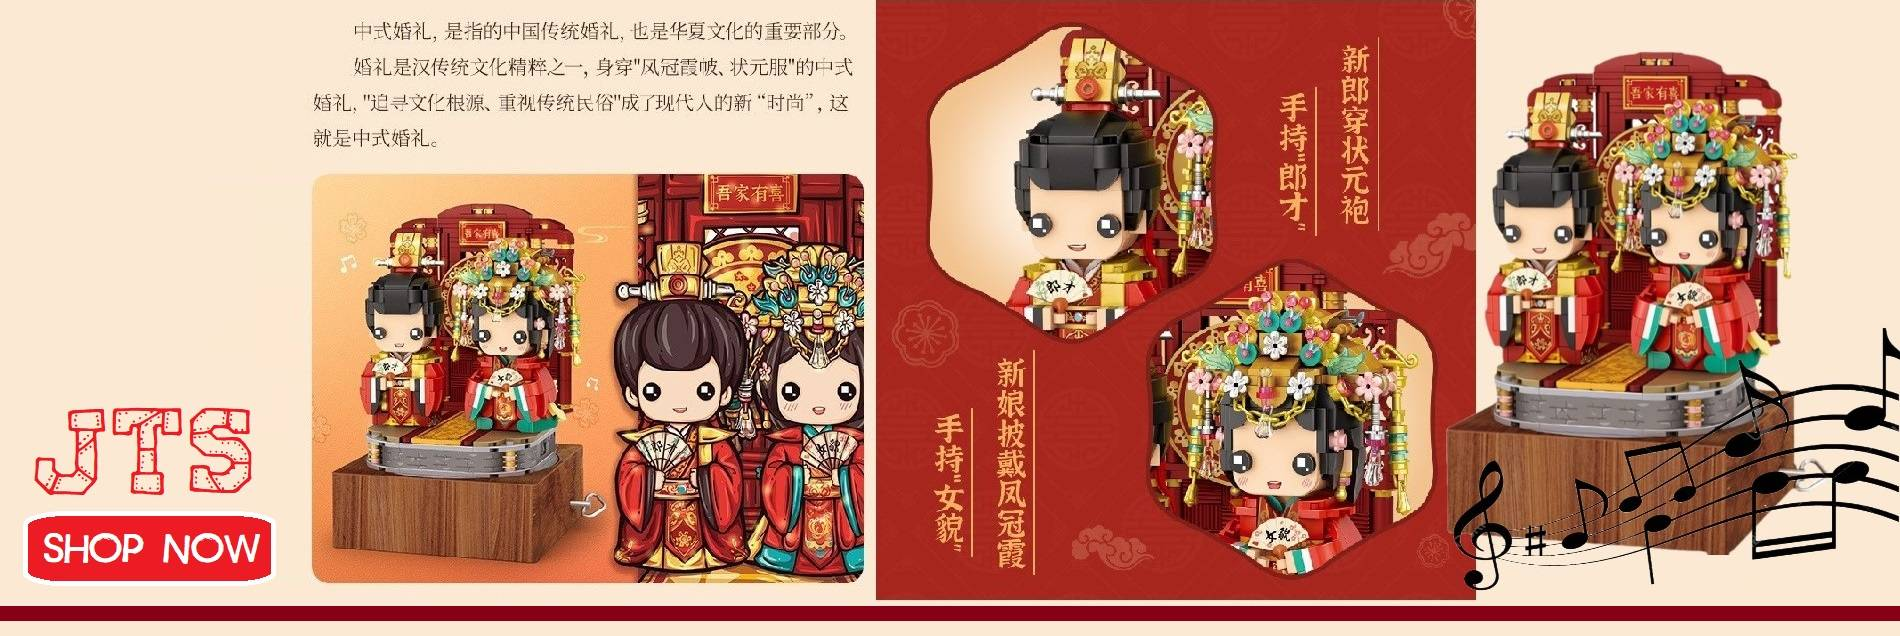 LOZ Traditional Wedding Music Box 1227